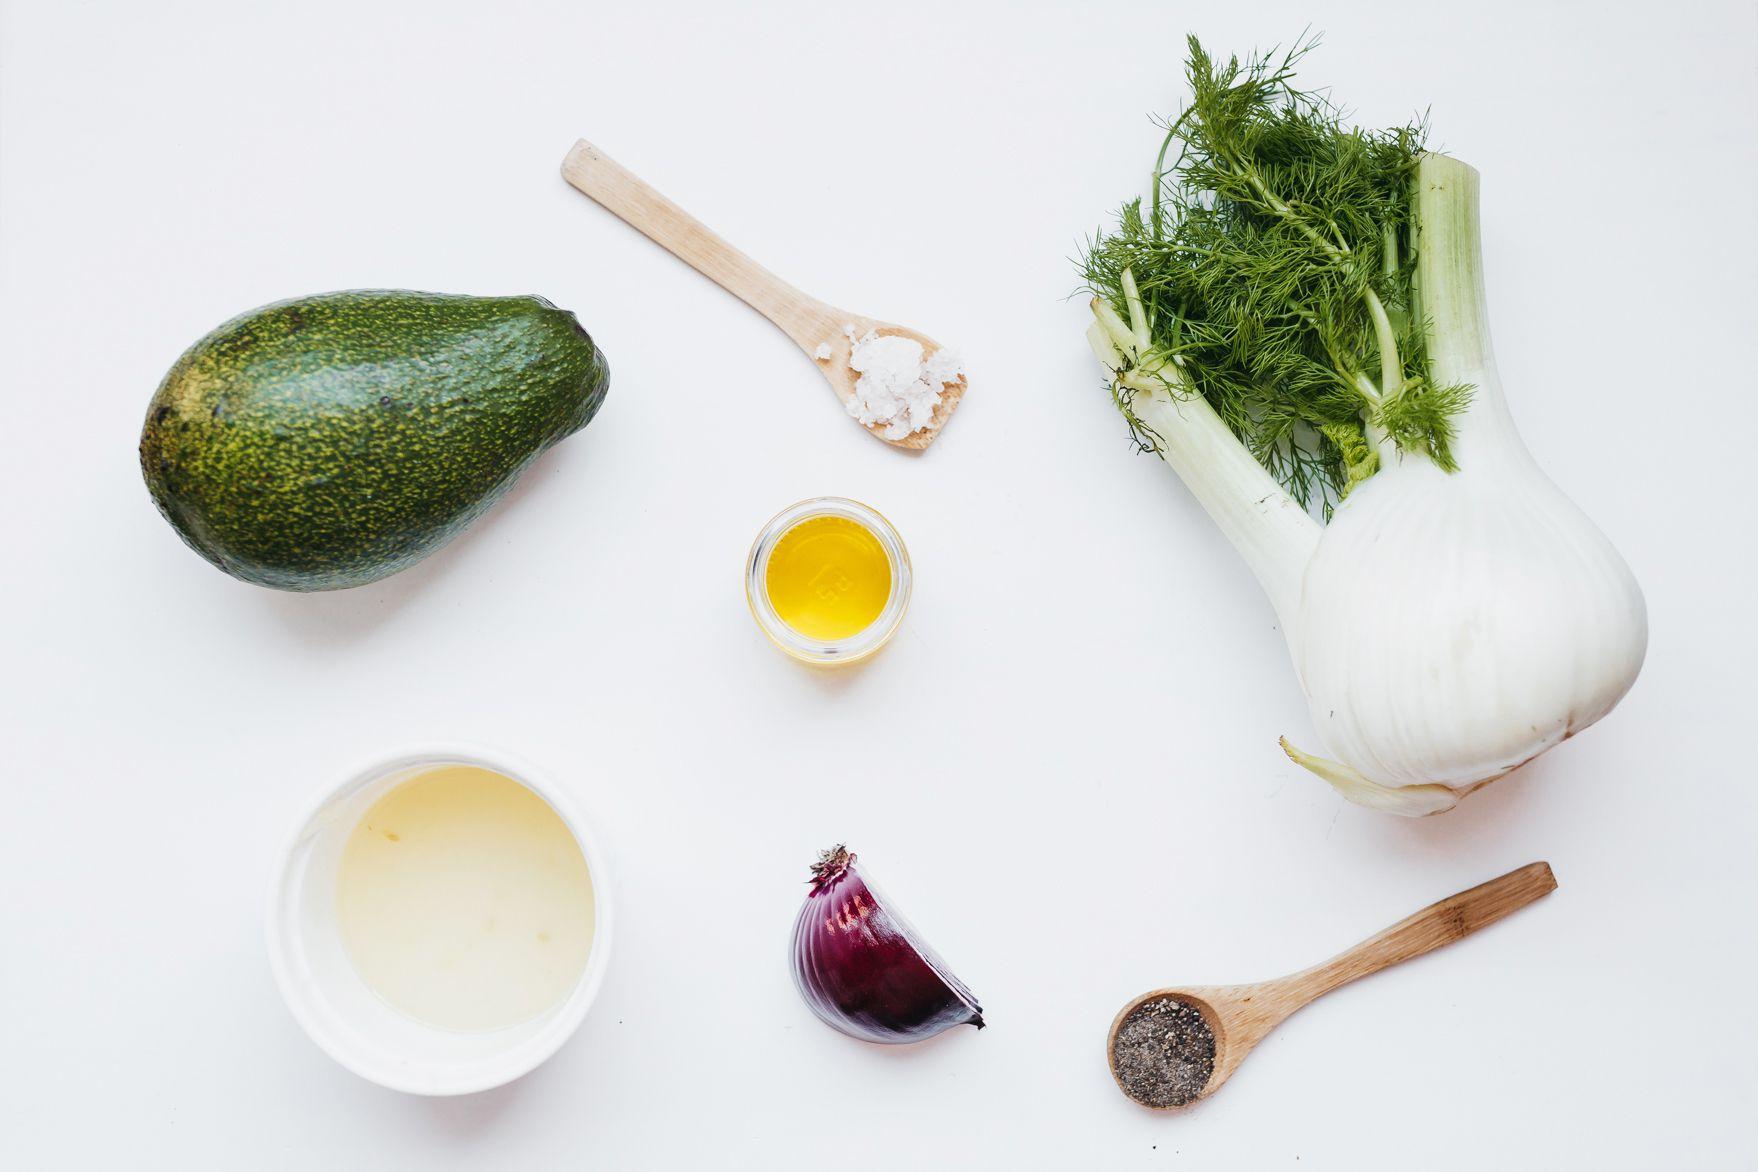 Ingredients for avocado fennel salad